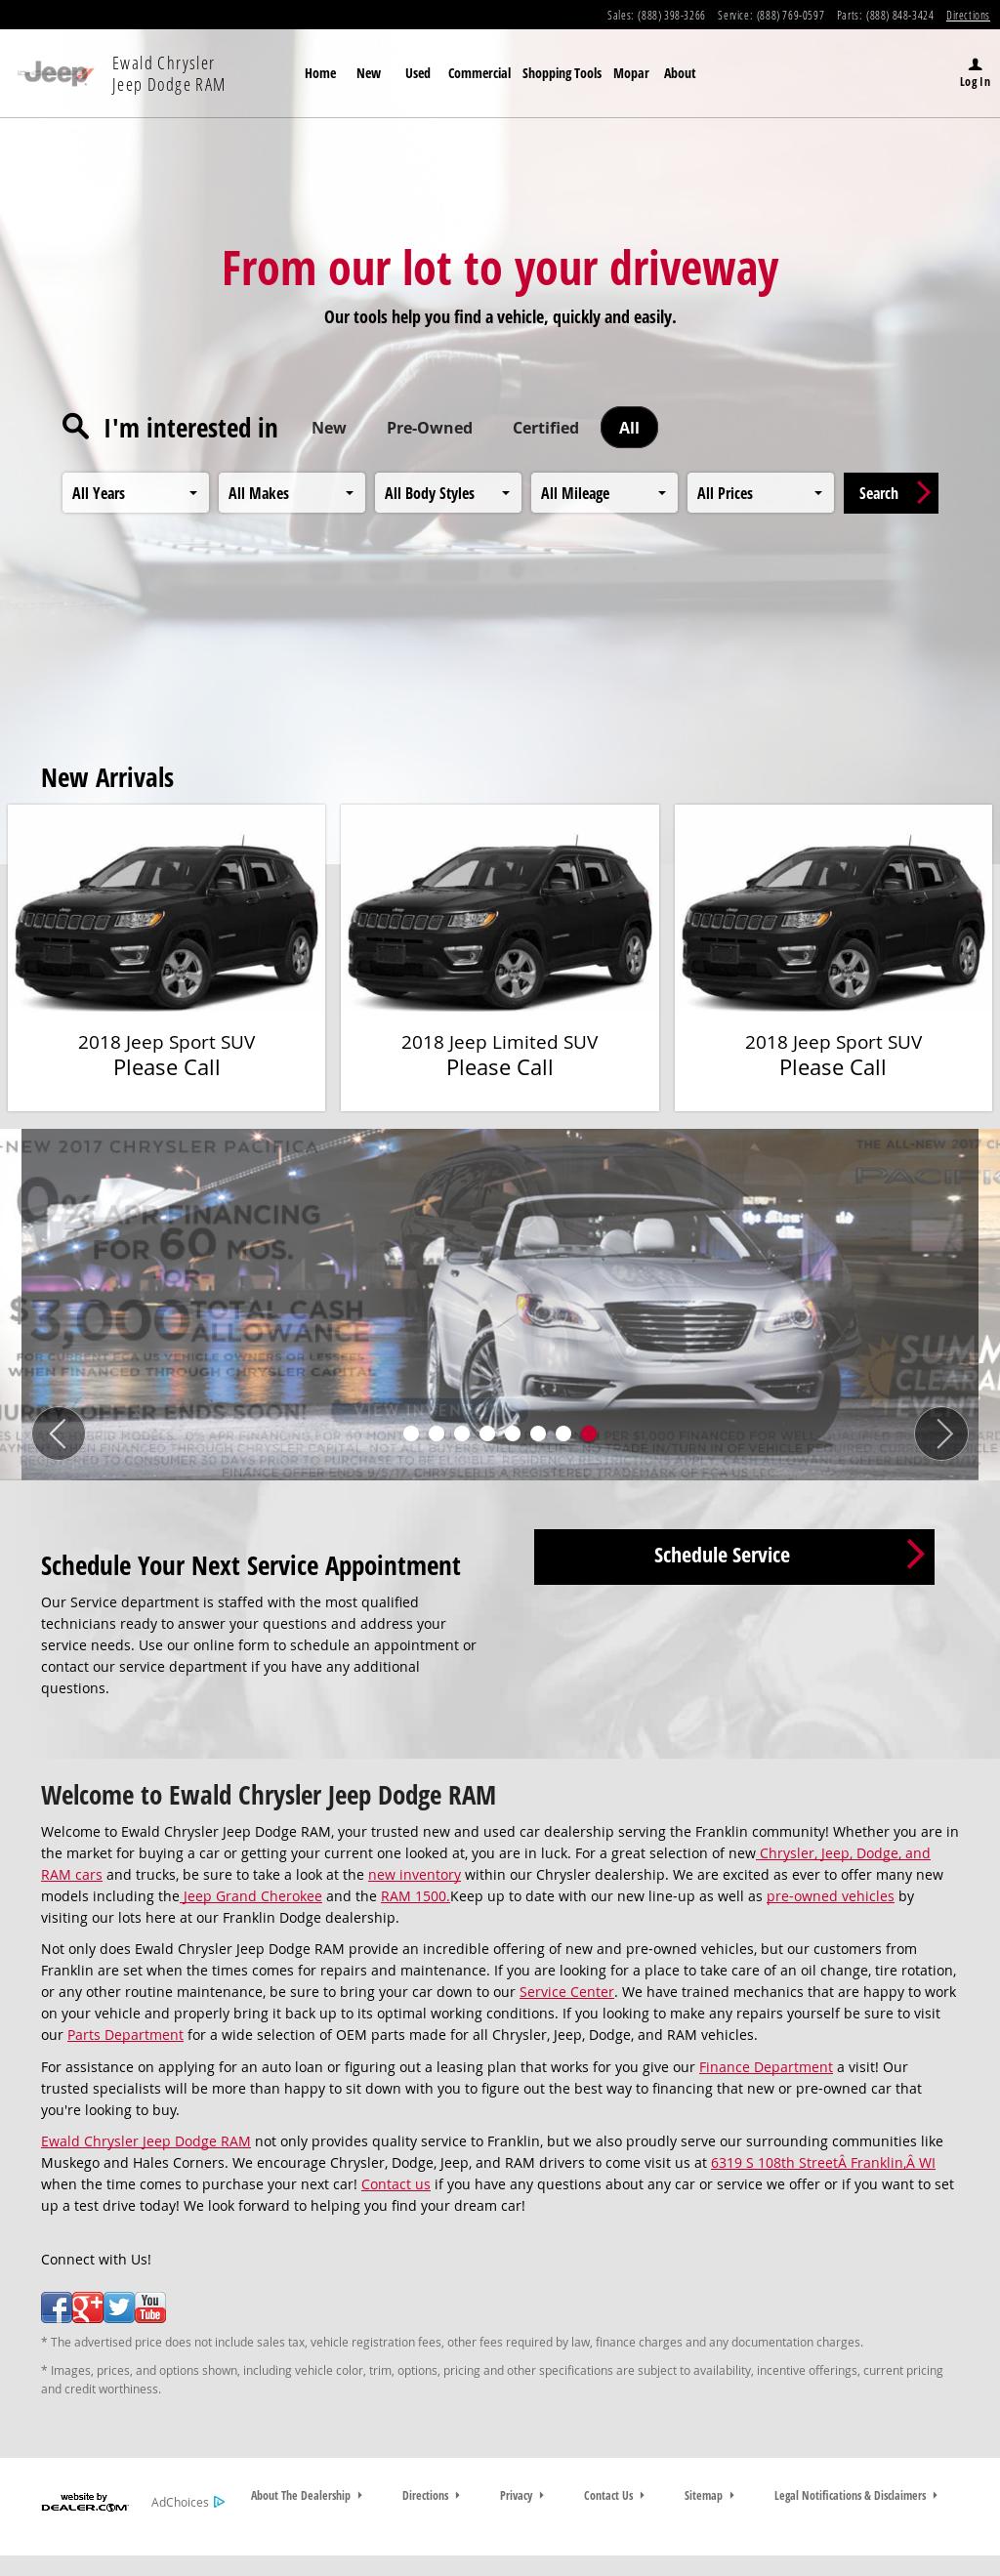 Ewald Chrysler Jeep Dodge Ram Website History